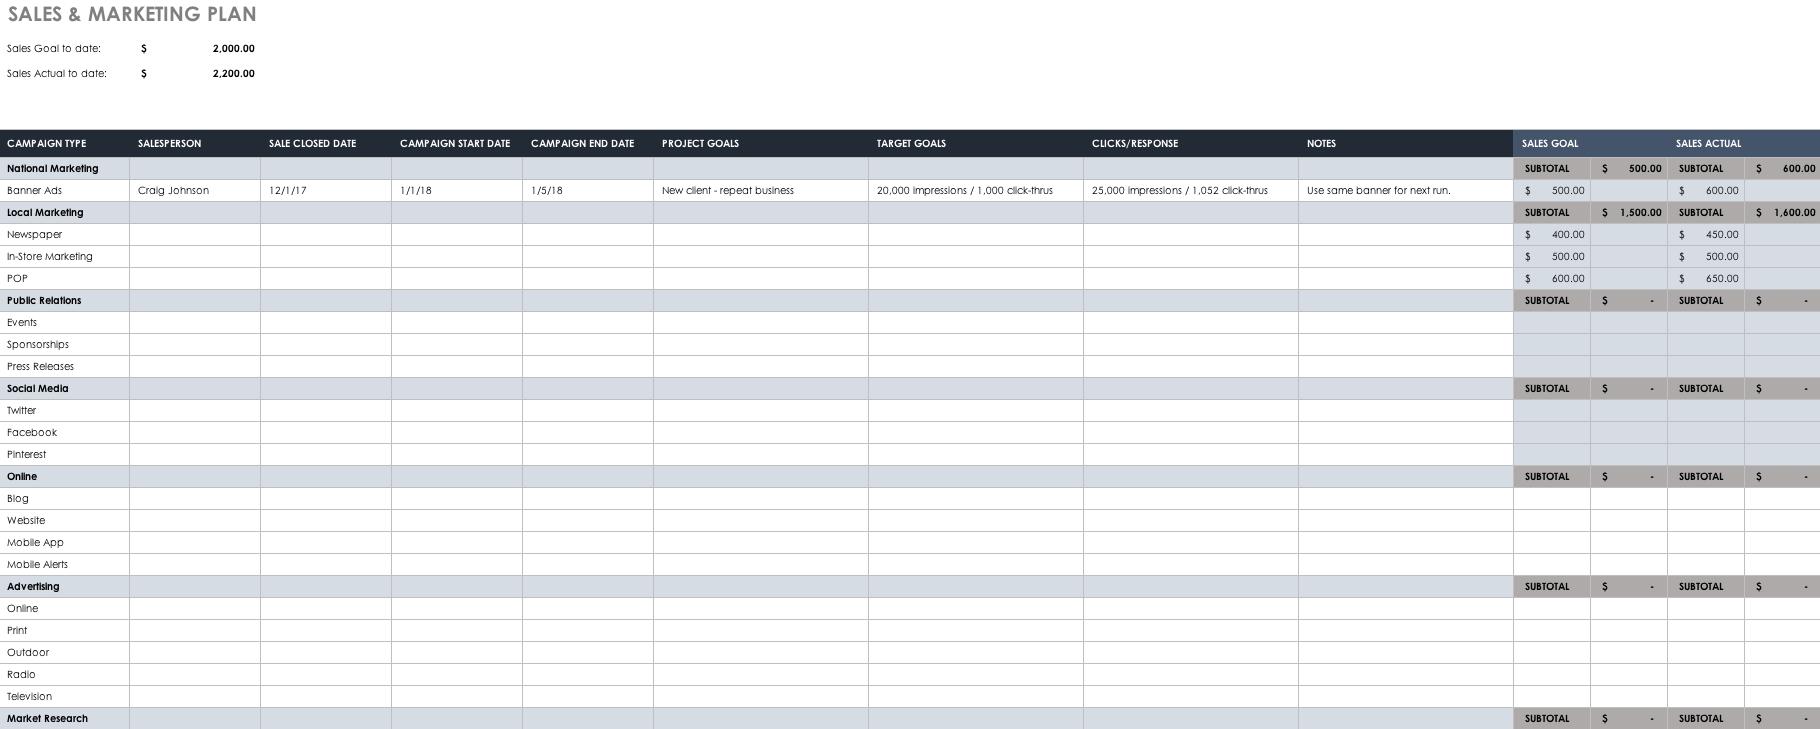 Free Marketing Plan Templates For Excel | Smartsheet Also Marketing Spreadsheet Template